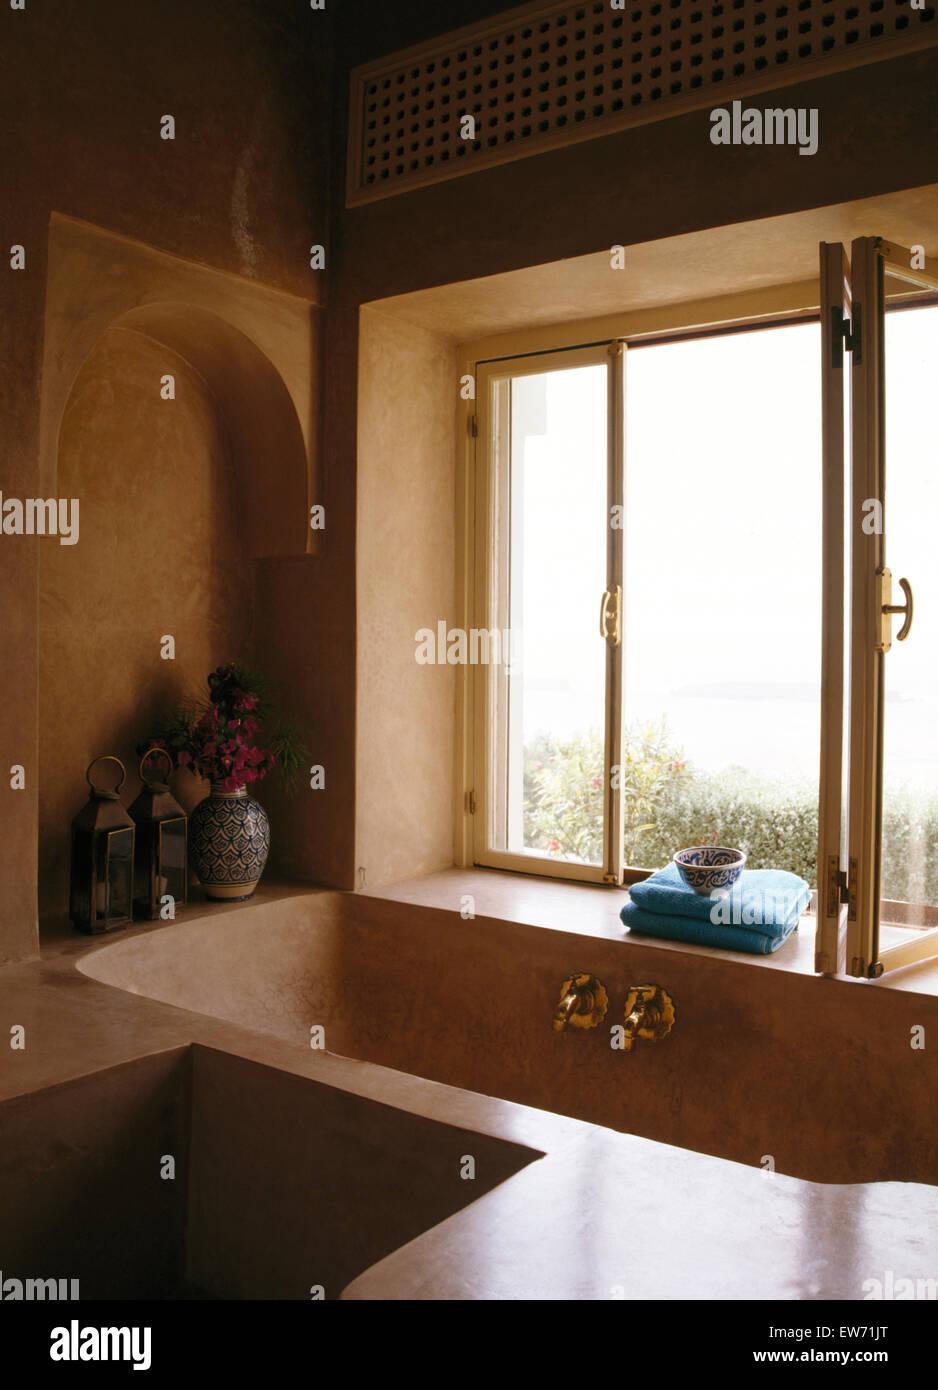 Moulded, polished concrete bath below window in modern Moroccan bathroom - Stock Image